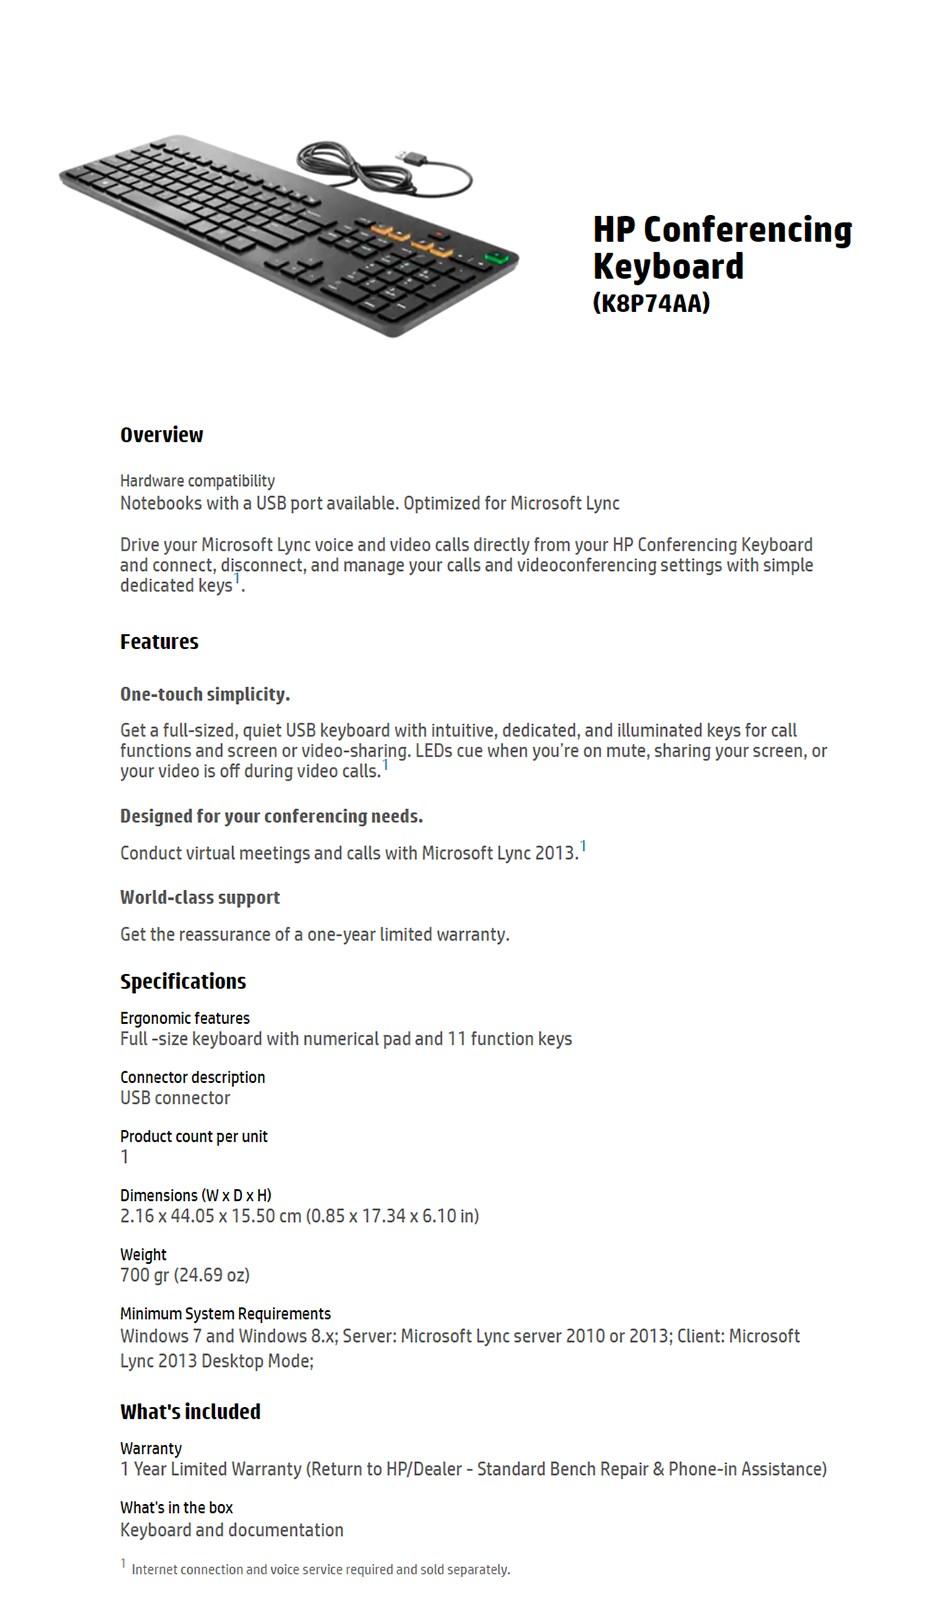 HP Conferencing Keyboard - K8P74AA - Desktop Overview 1